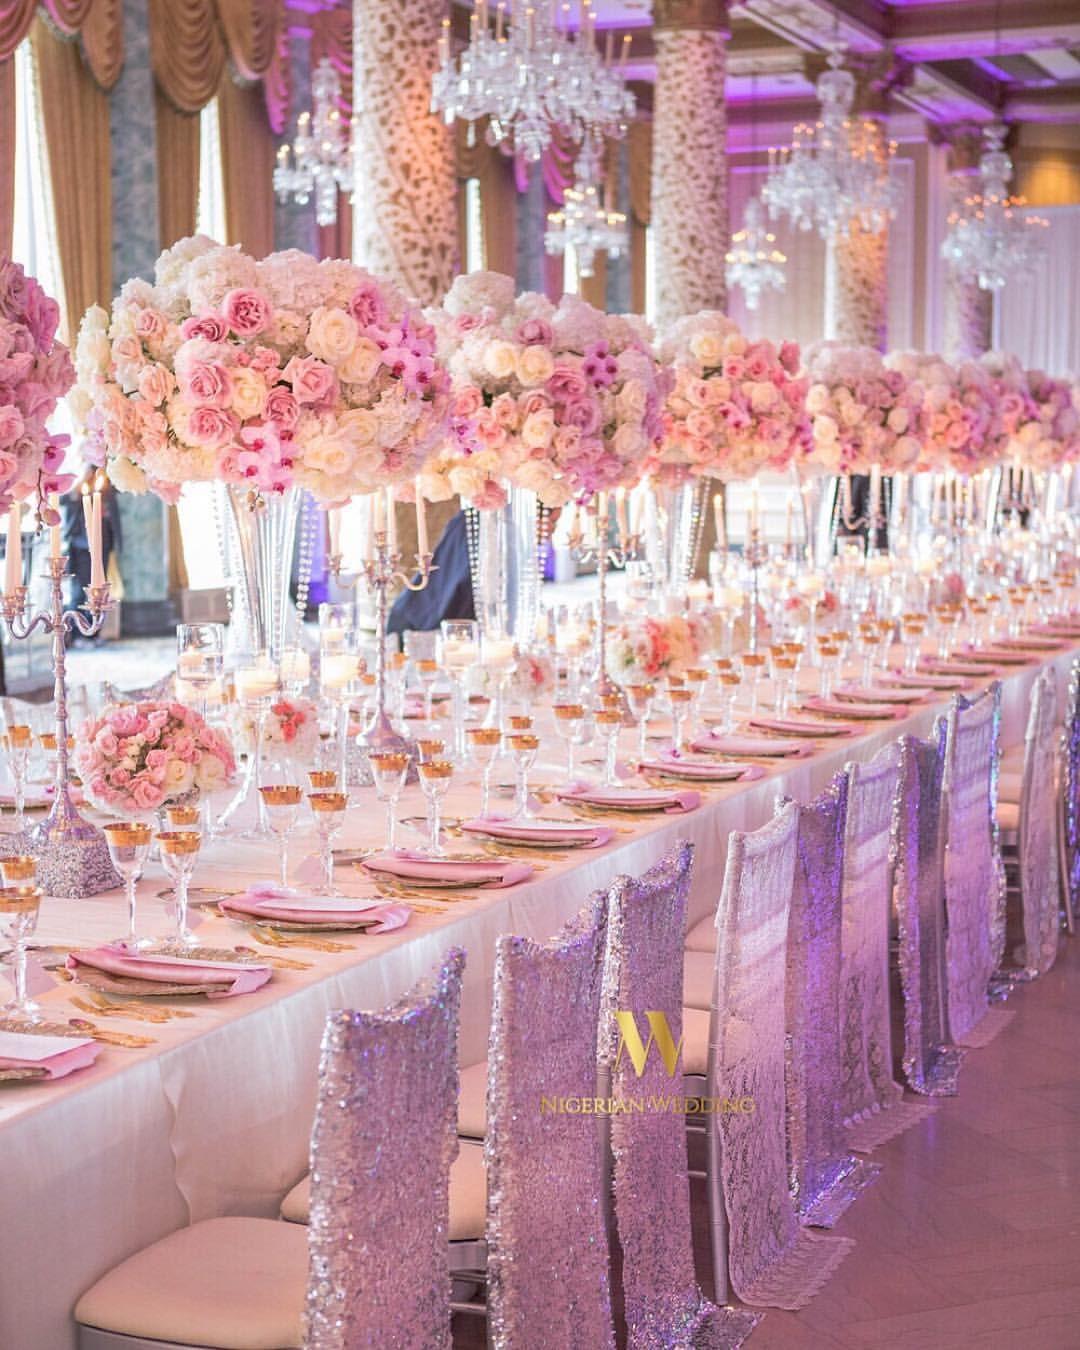 Nigerian wedding decoration images  Pin by Sara on Beautiful ideas  Pinterest  Lush fresh Floral